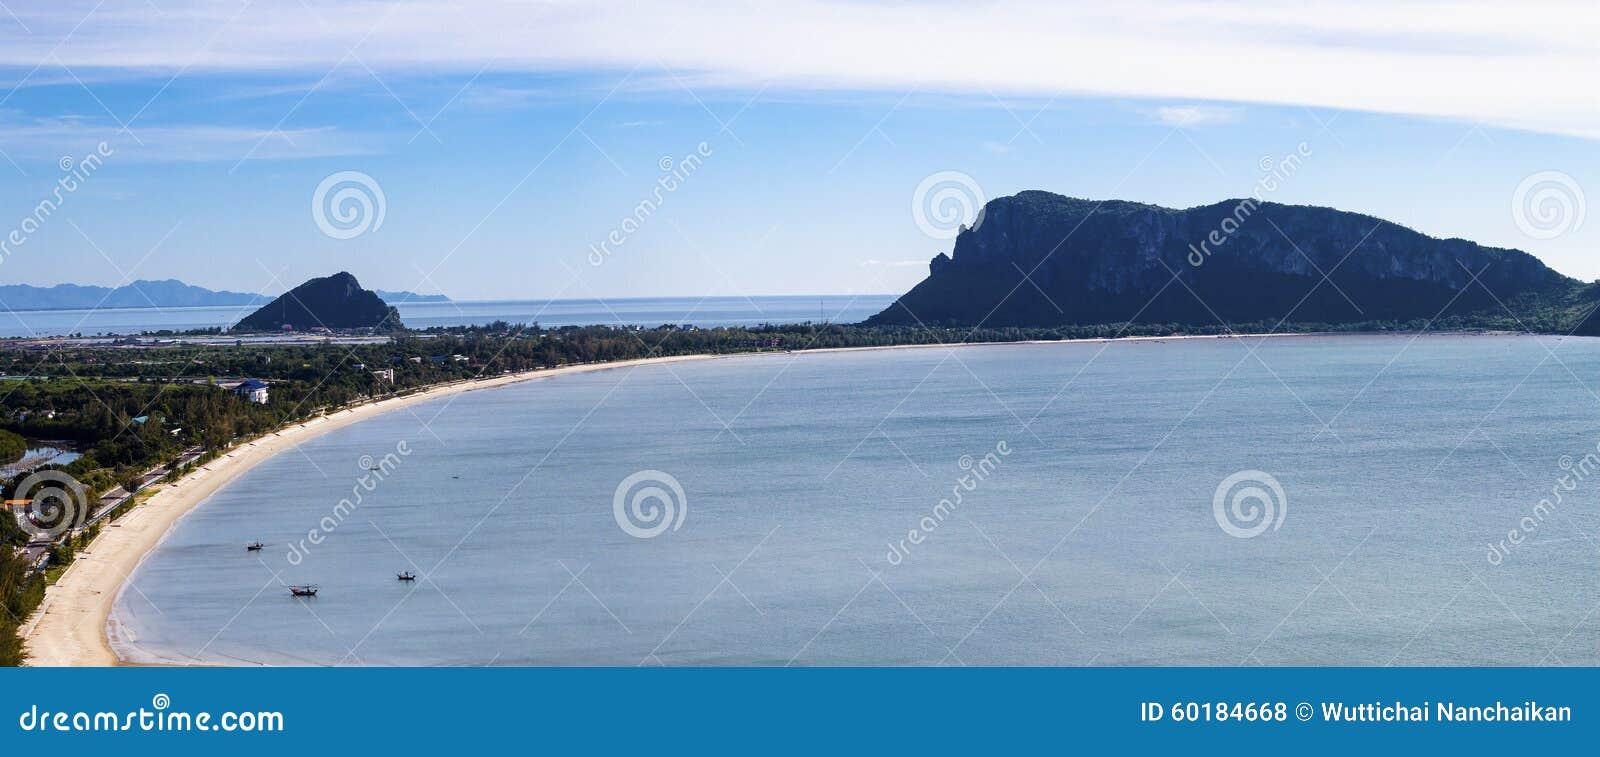 Beautiful curve of beach